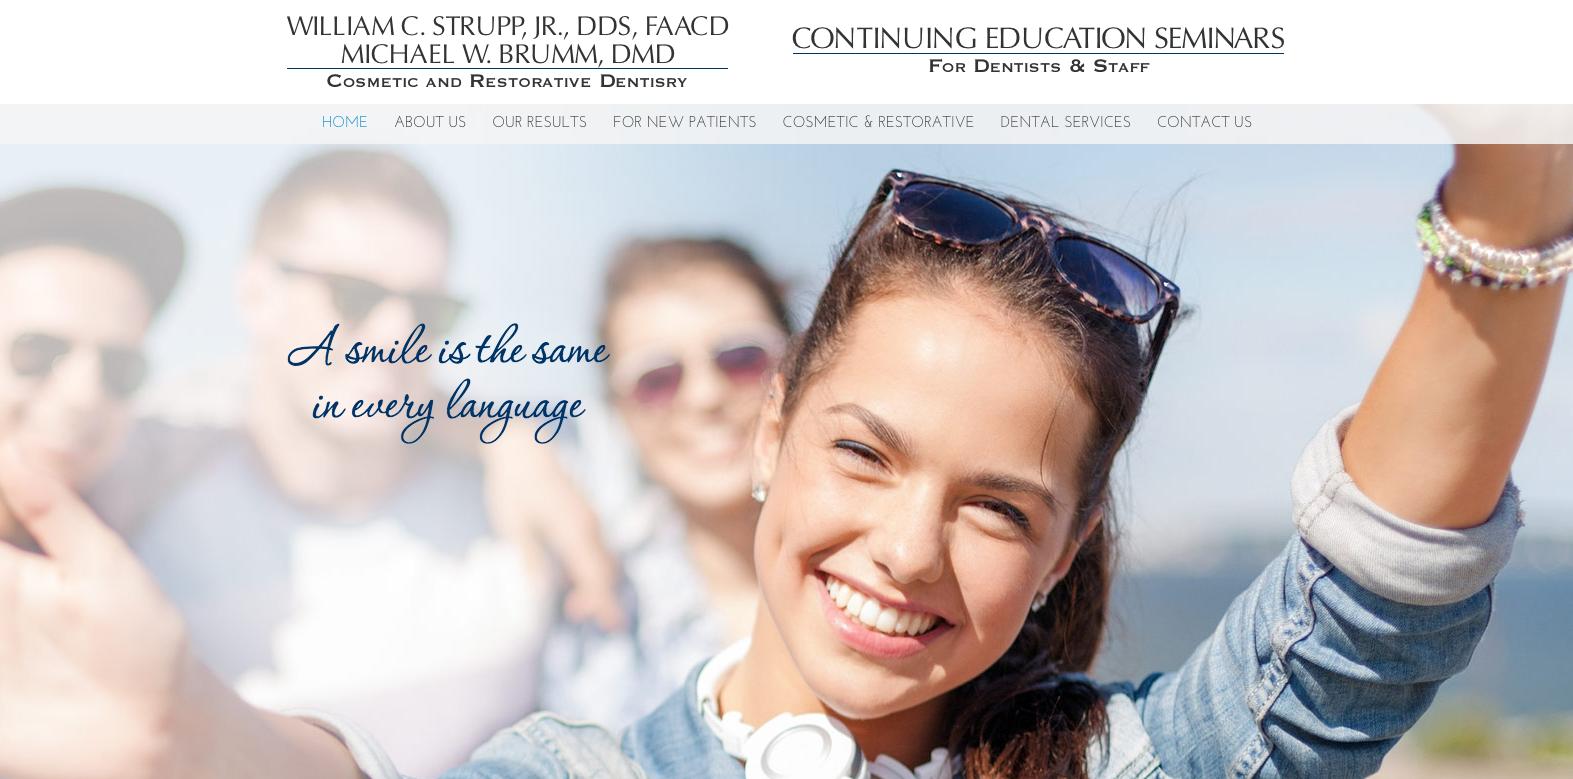 sesamewebdesign psds dental responsive white blue